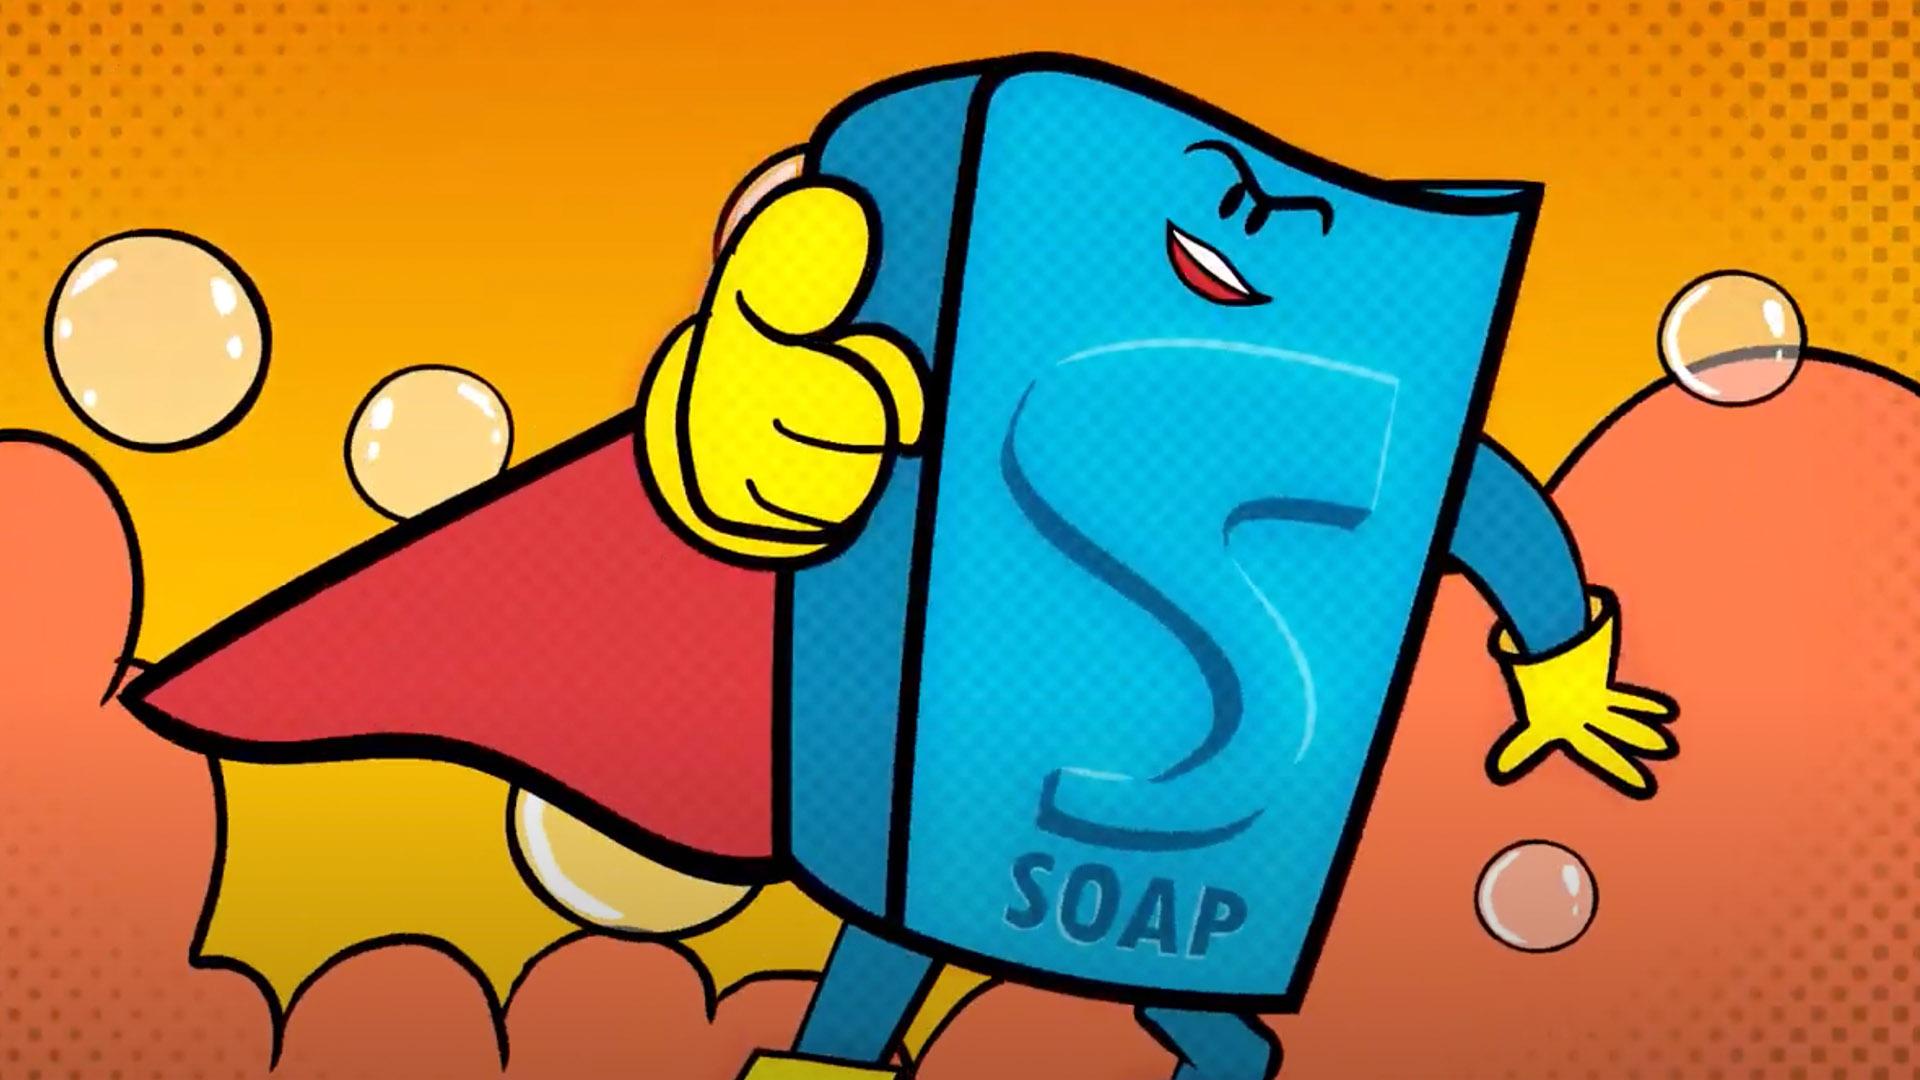 soapman